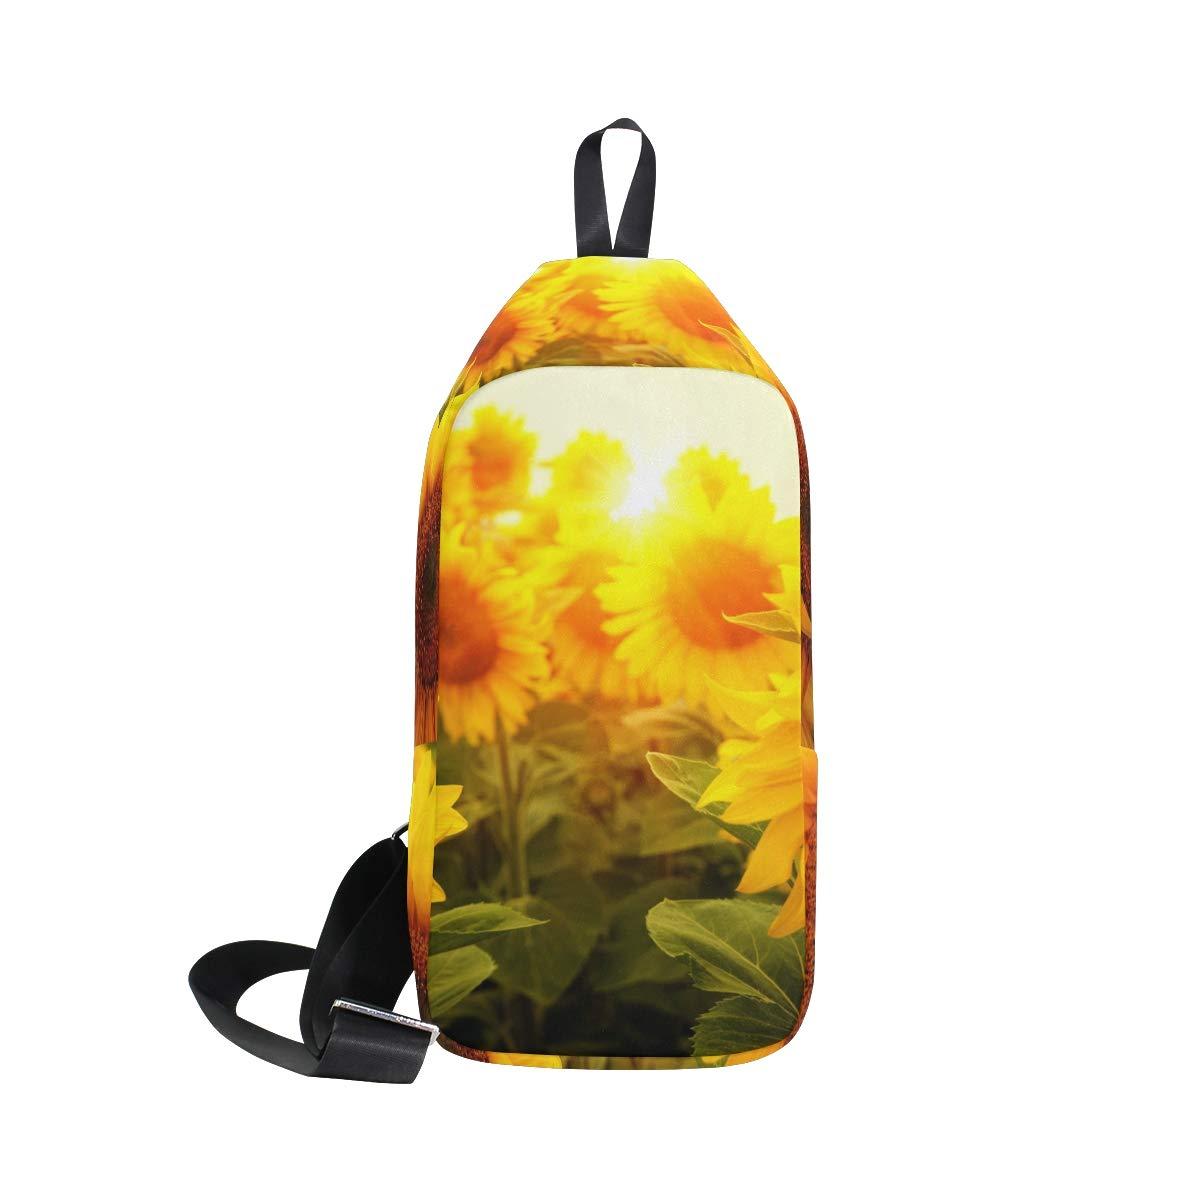 TFONE Summer Sunflower Flower Crossbody Bag Lightweight Chest Shoulder Messenger Pack Backpack Sling Bag